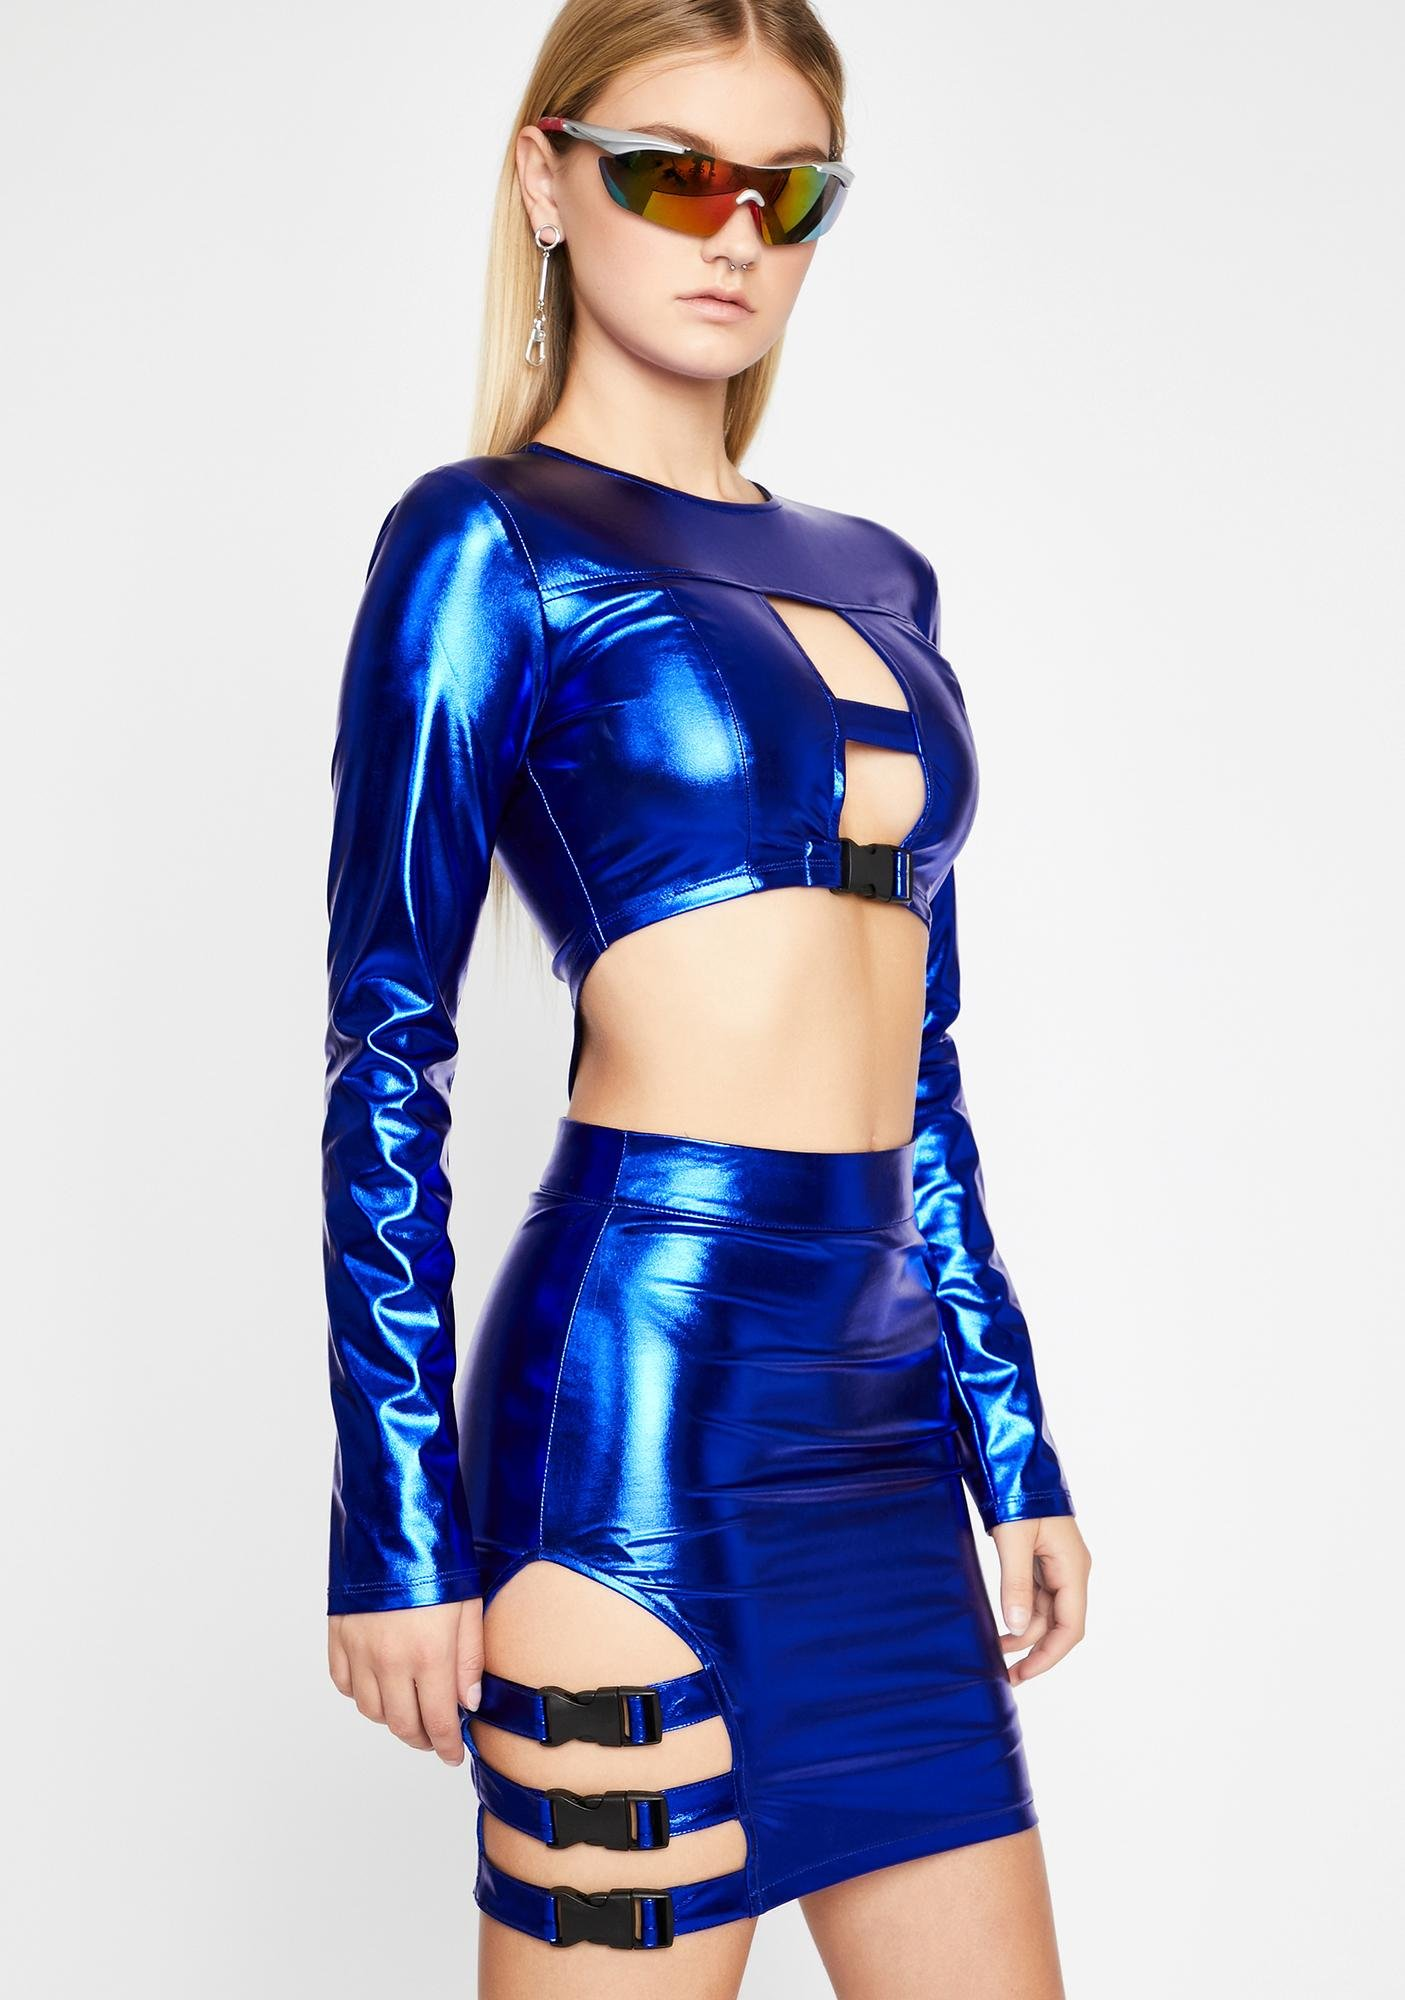 Intergalactic Commander Metallic Dress